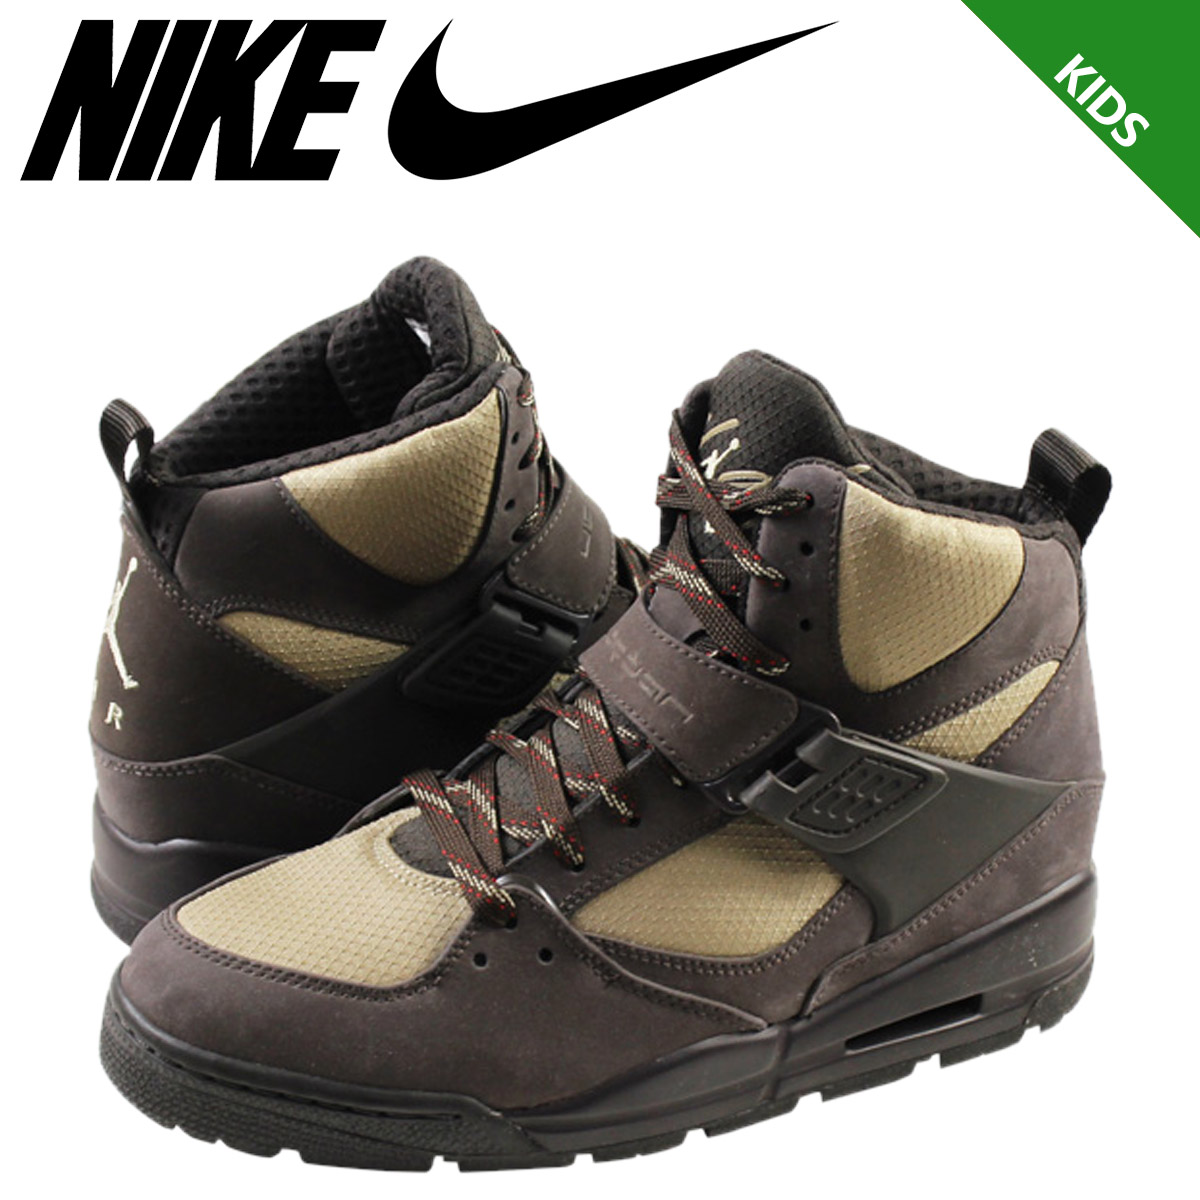 regard détaillé 1279e 0f900 NIKE Nike Air Jordan sneakers boots JORDAN FLIGHT 45 TRK Jordan flight 45  trek 467,927-204 men's shoes brown